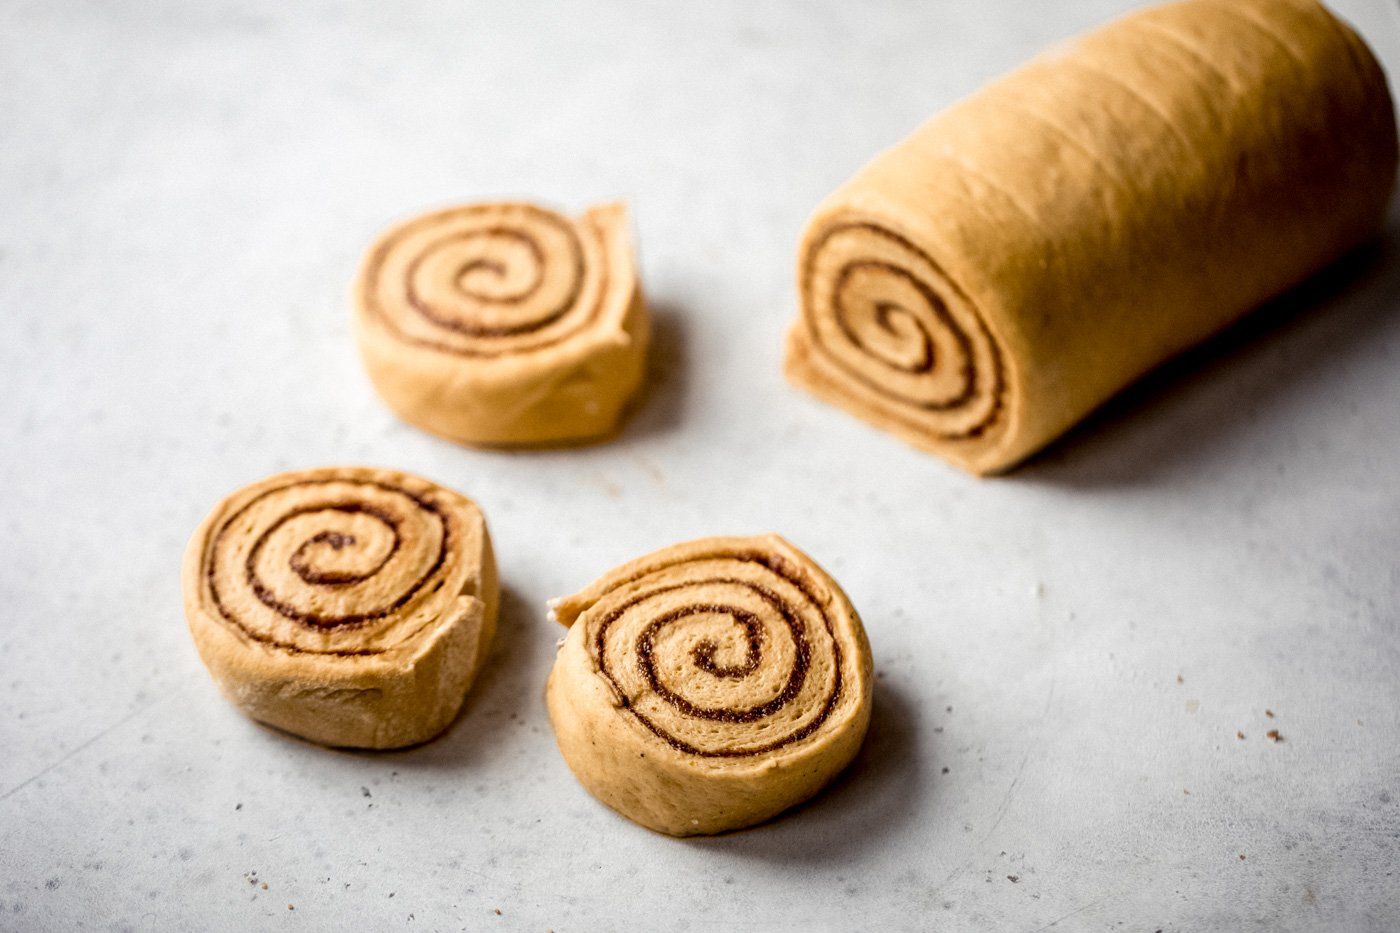 pumpkin cinnamon roll dough being cut